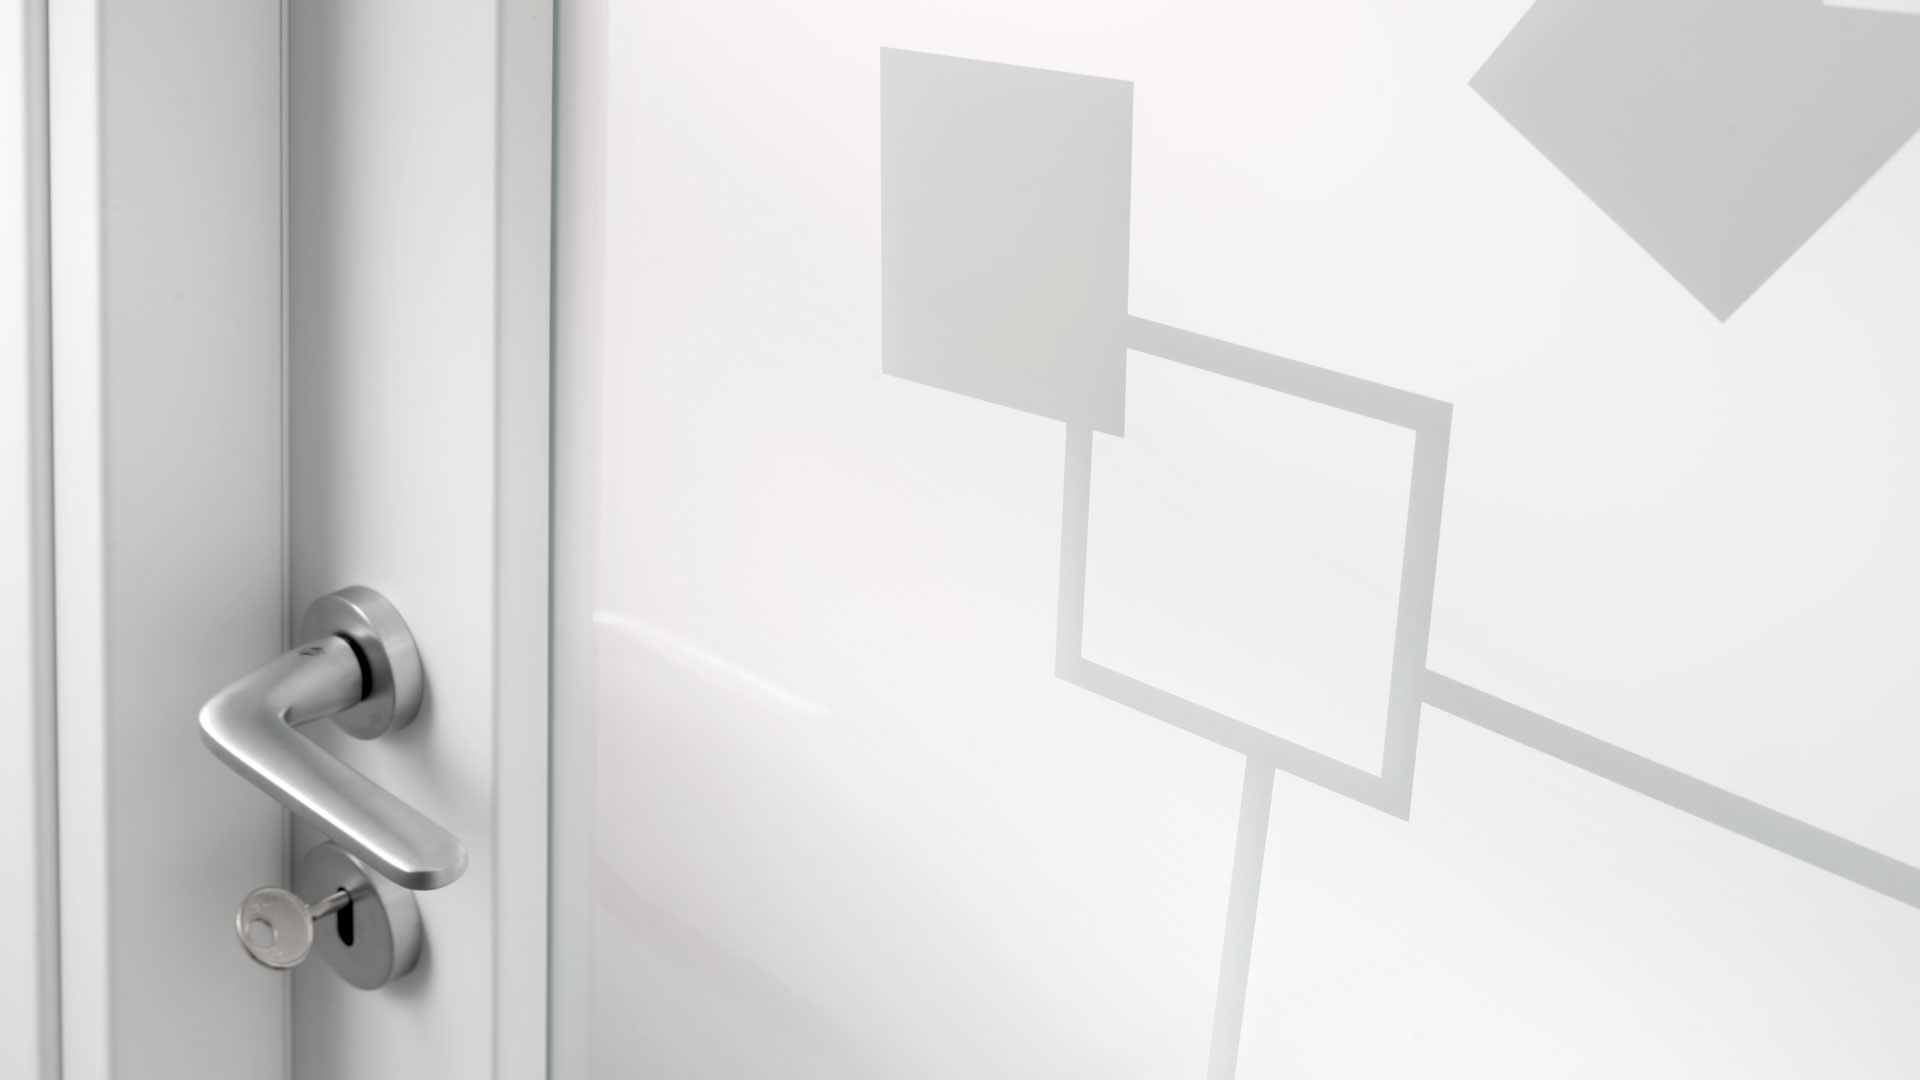 CMporte-porta-vetro-slide-1920×1080-2